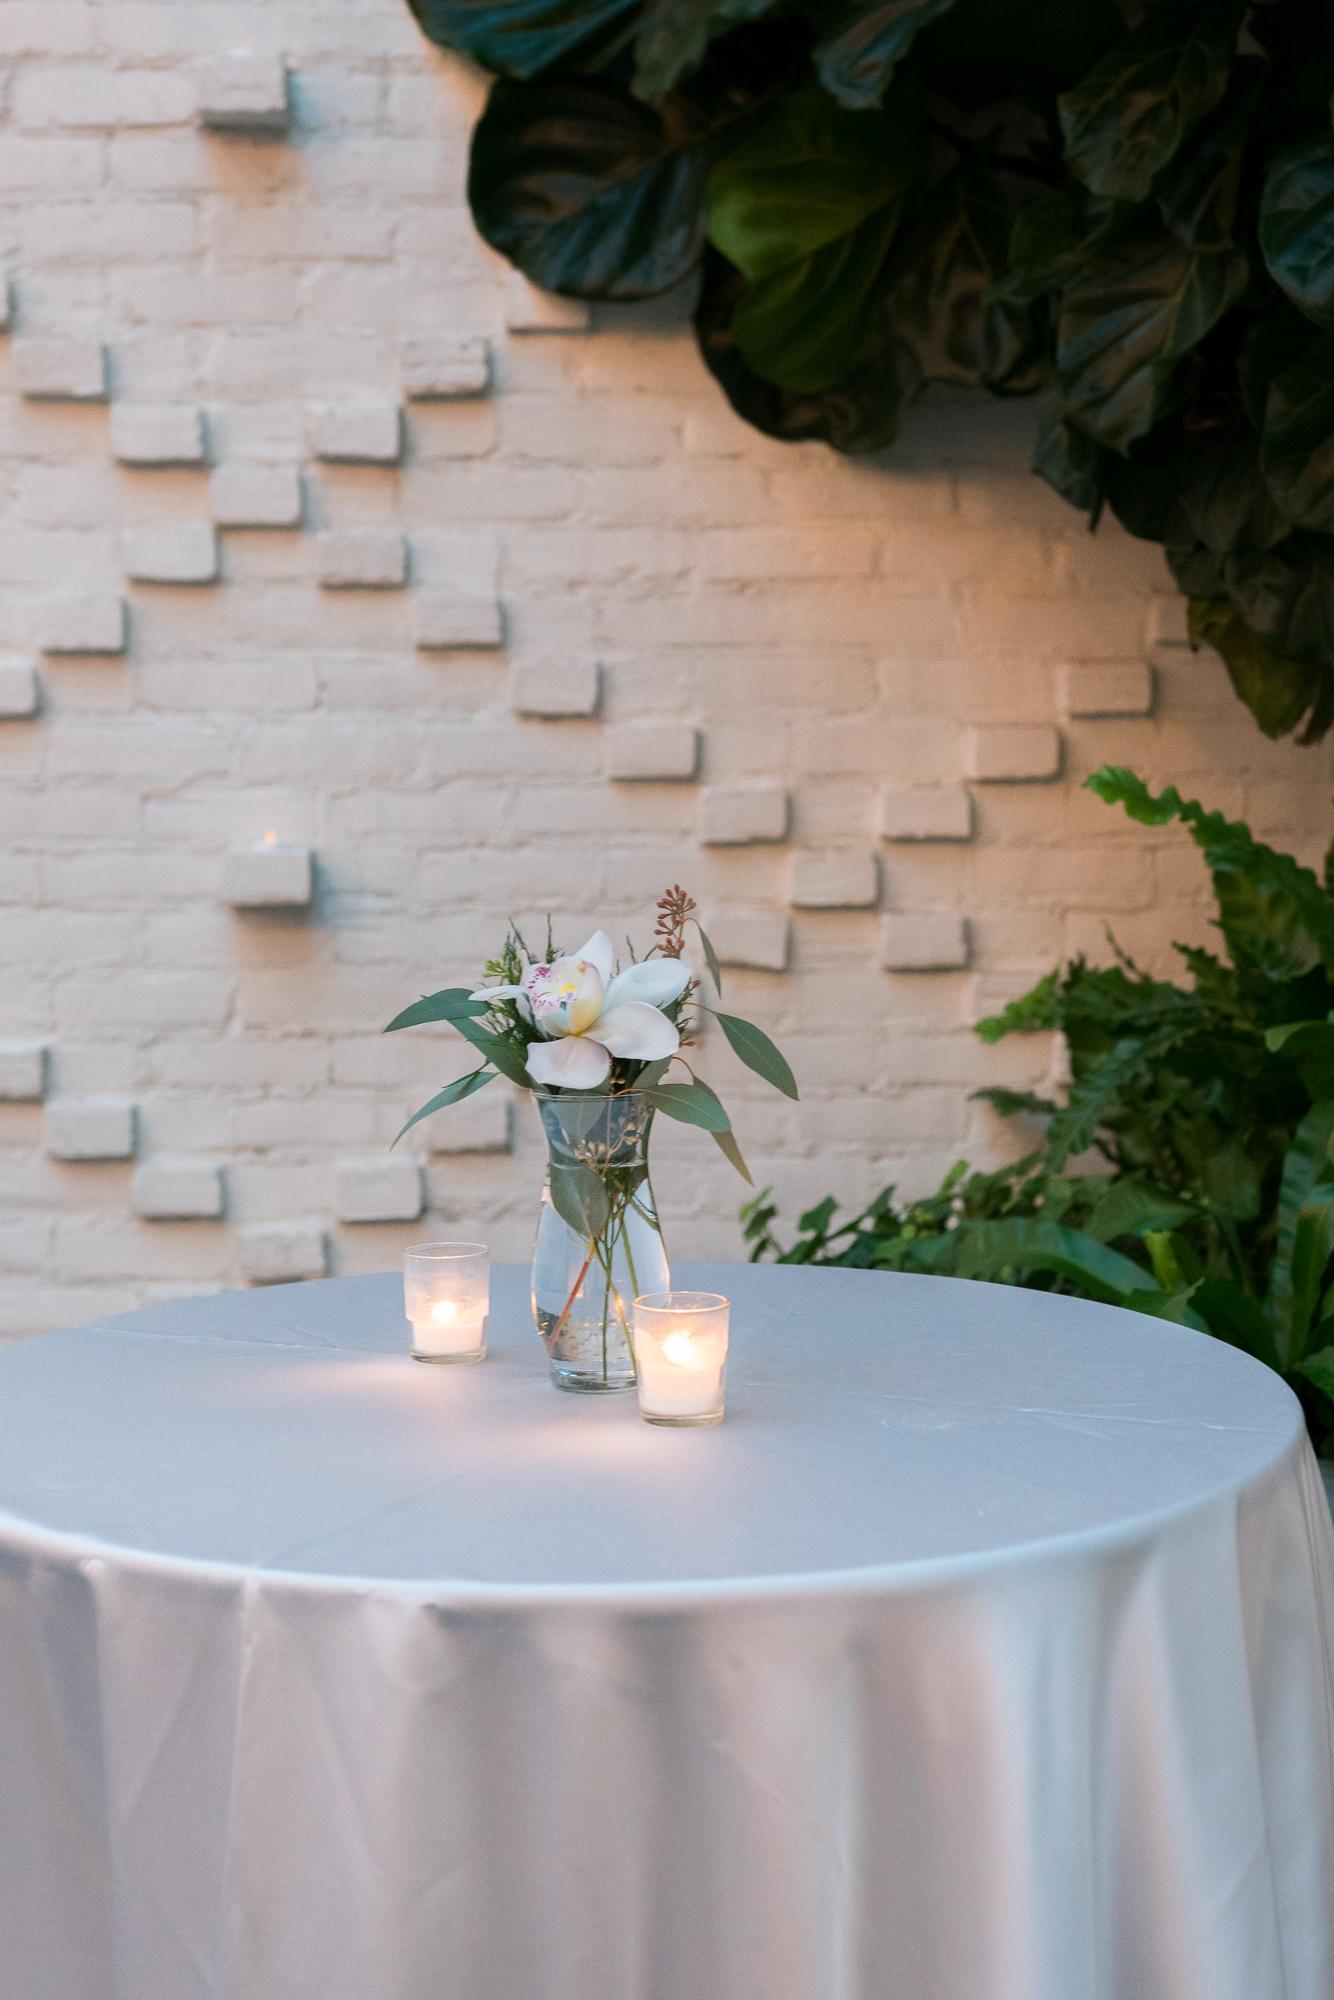 Oxford-Exchange-wedding-decoration